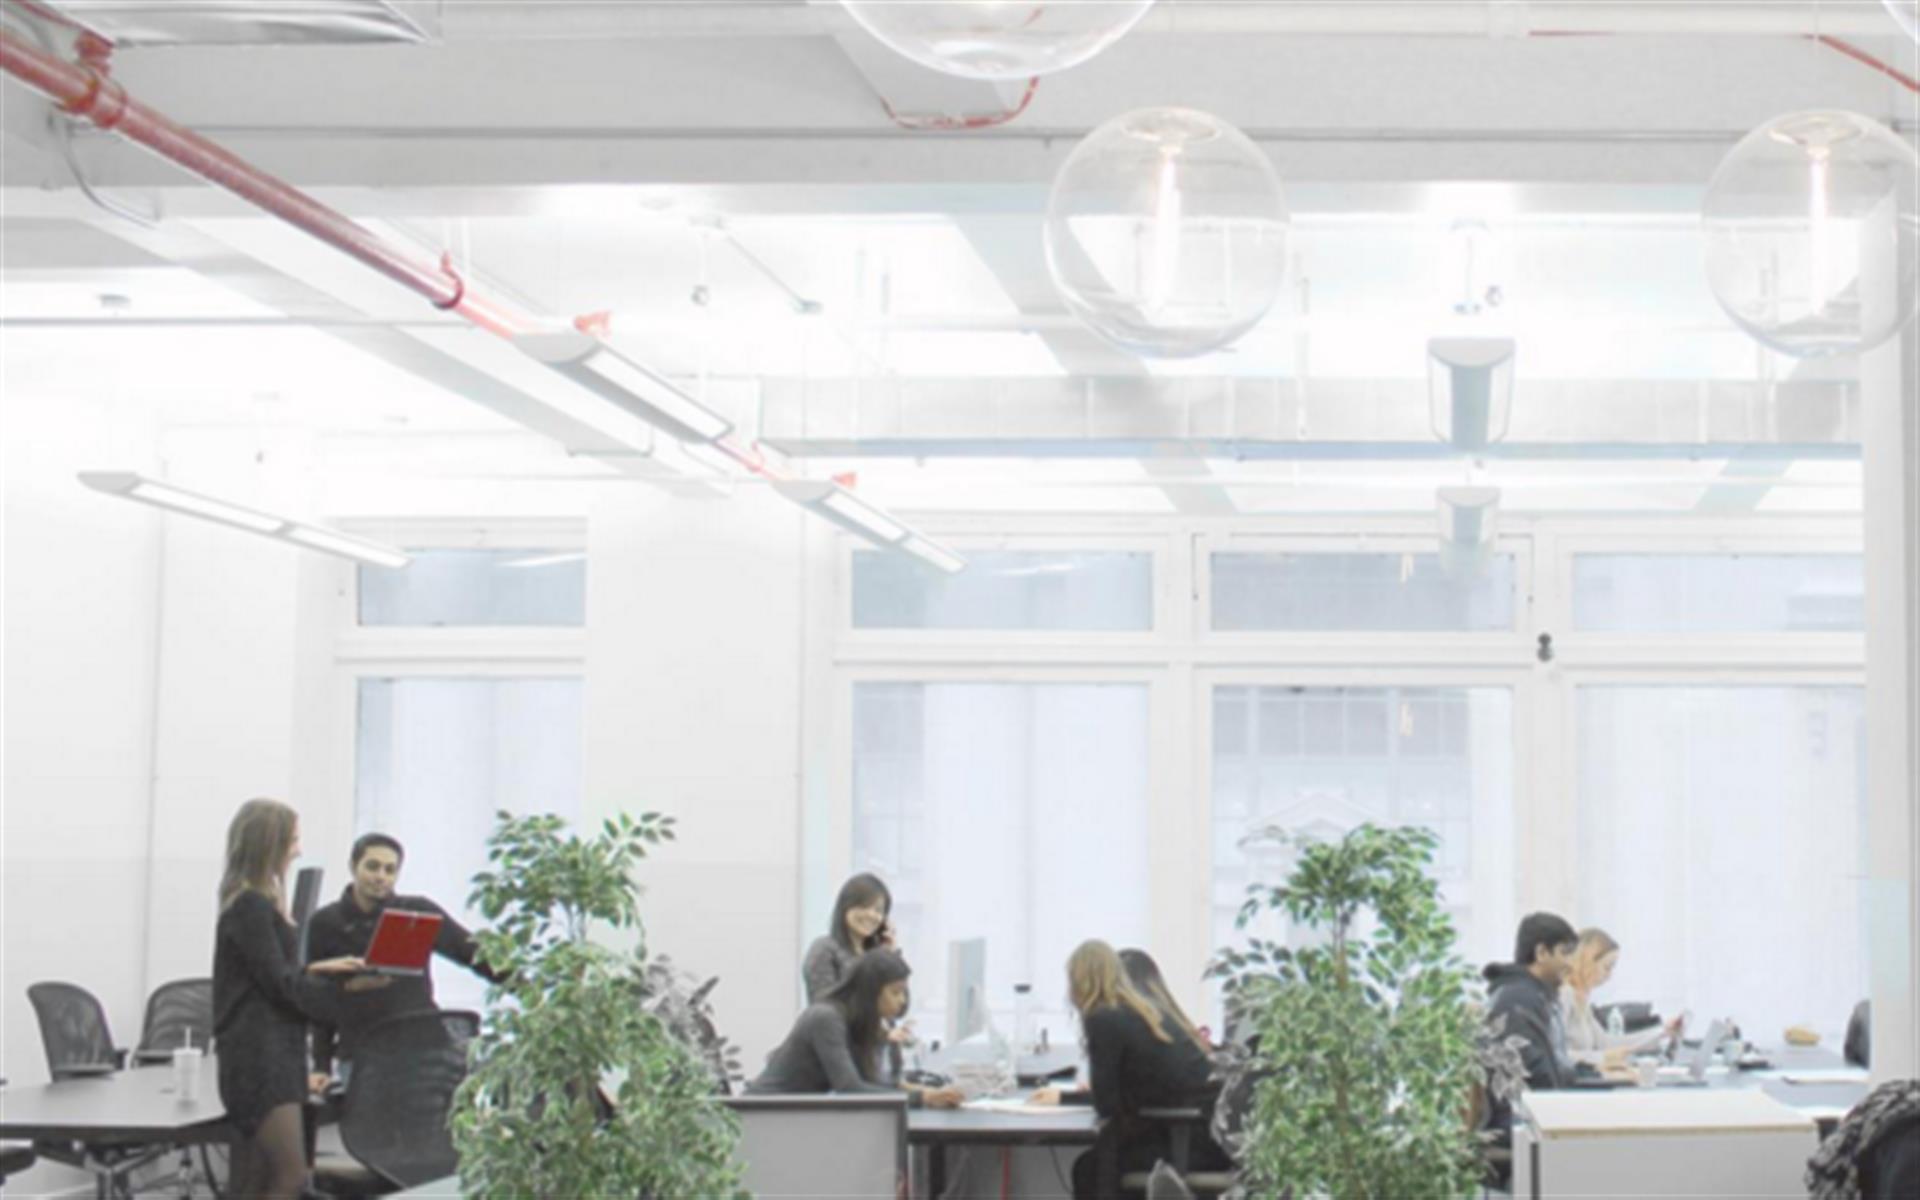 Ensemble - Coworking in Midtown Manhattan - Coworking - Hot Desk #2